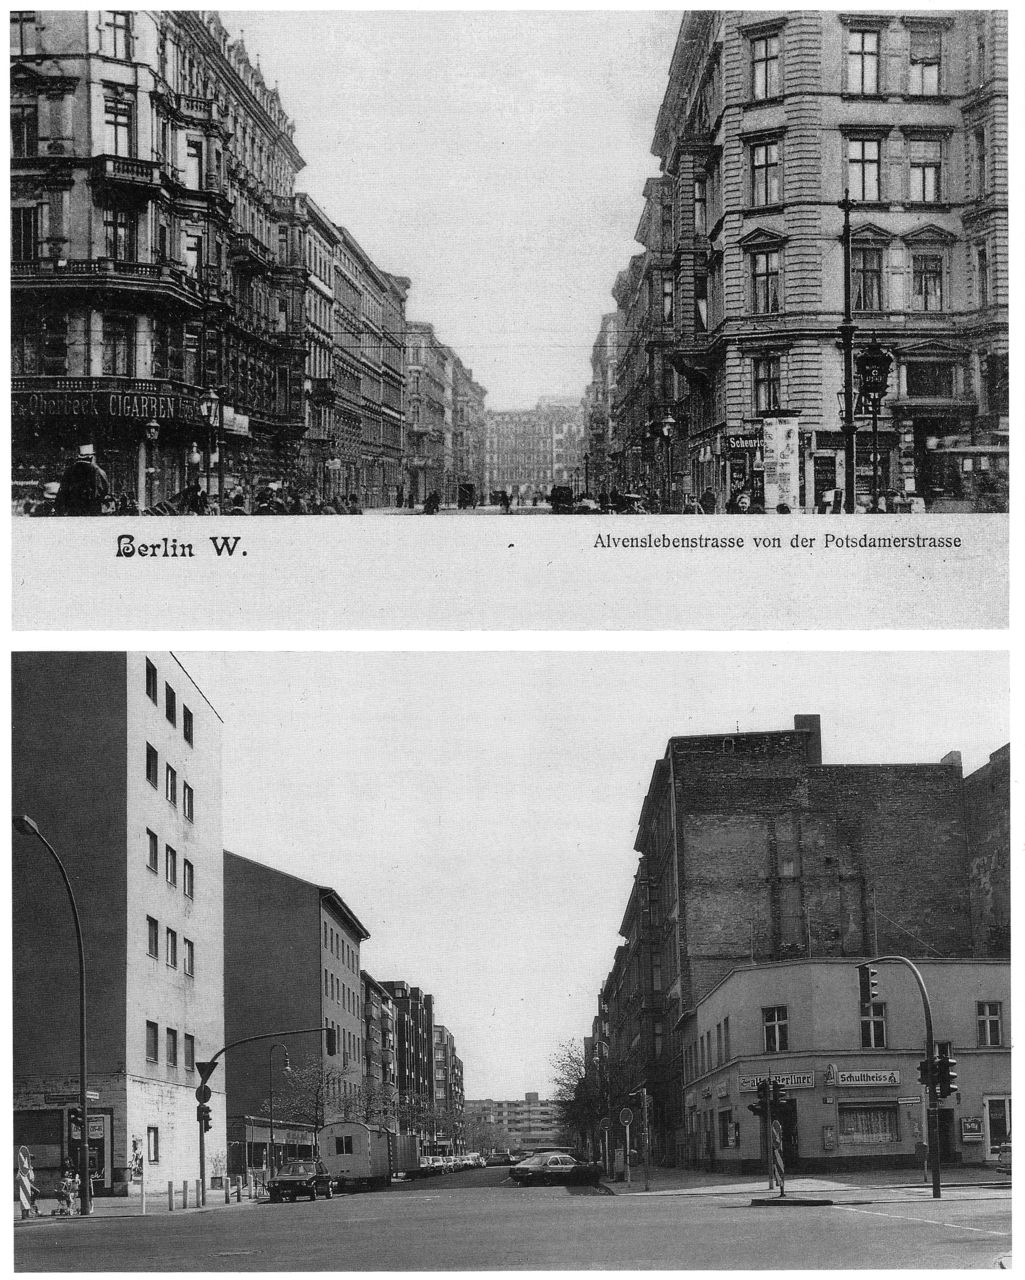 COMPARISON OF ALVENSLEBENSTRASSE (BERLIN) BEFORE THE WAR AND AFTER ...